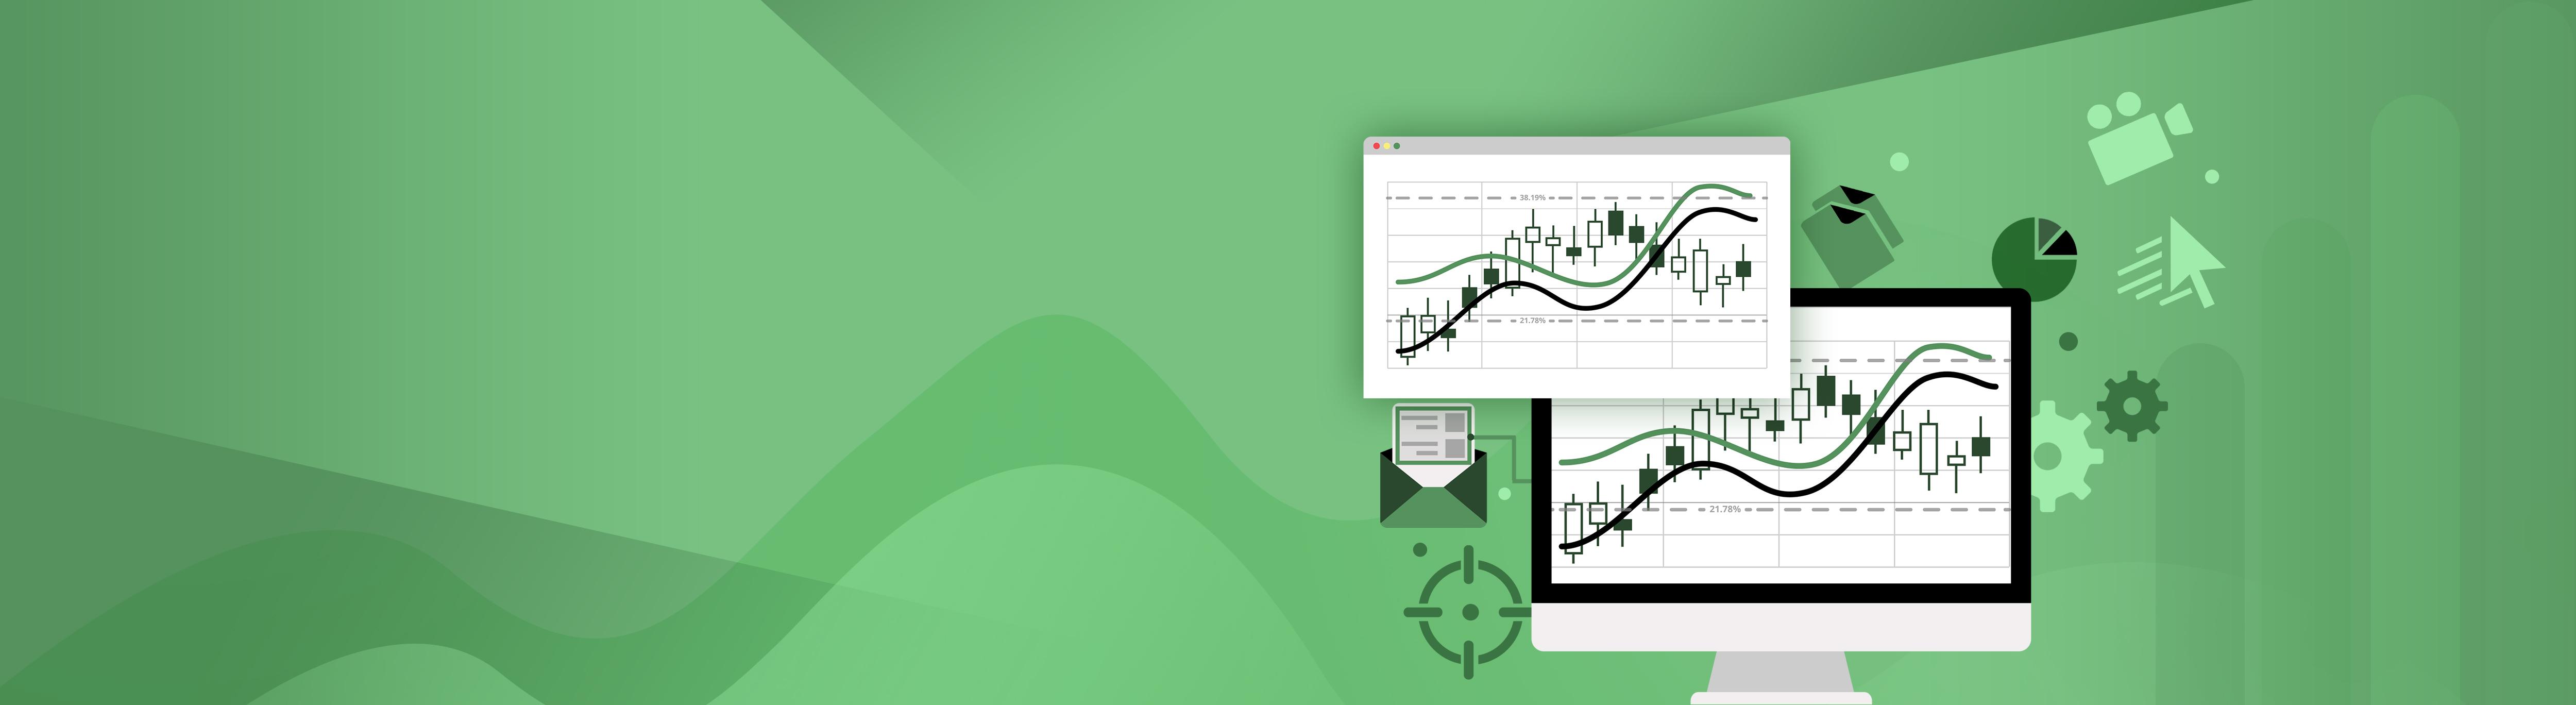 Exchange - performance marketing